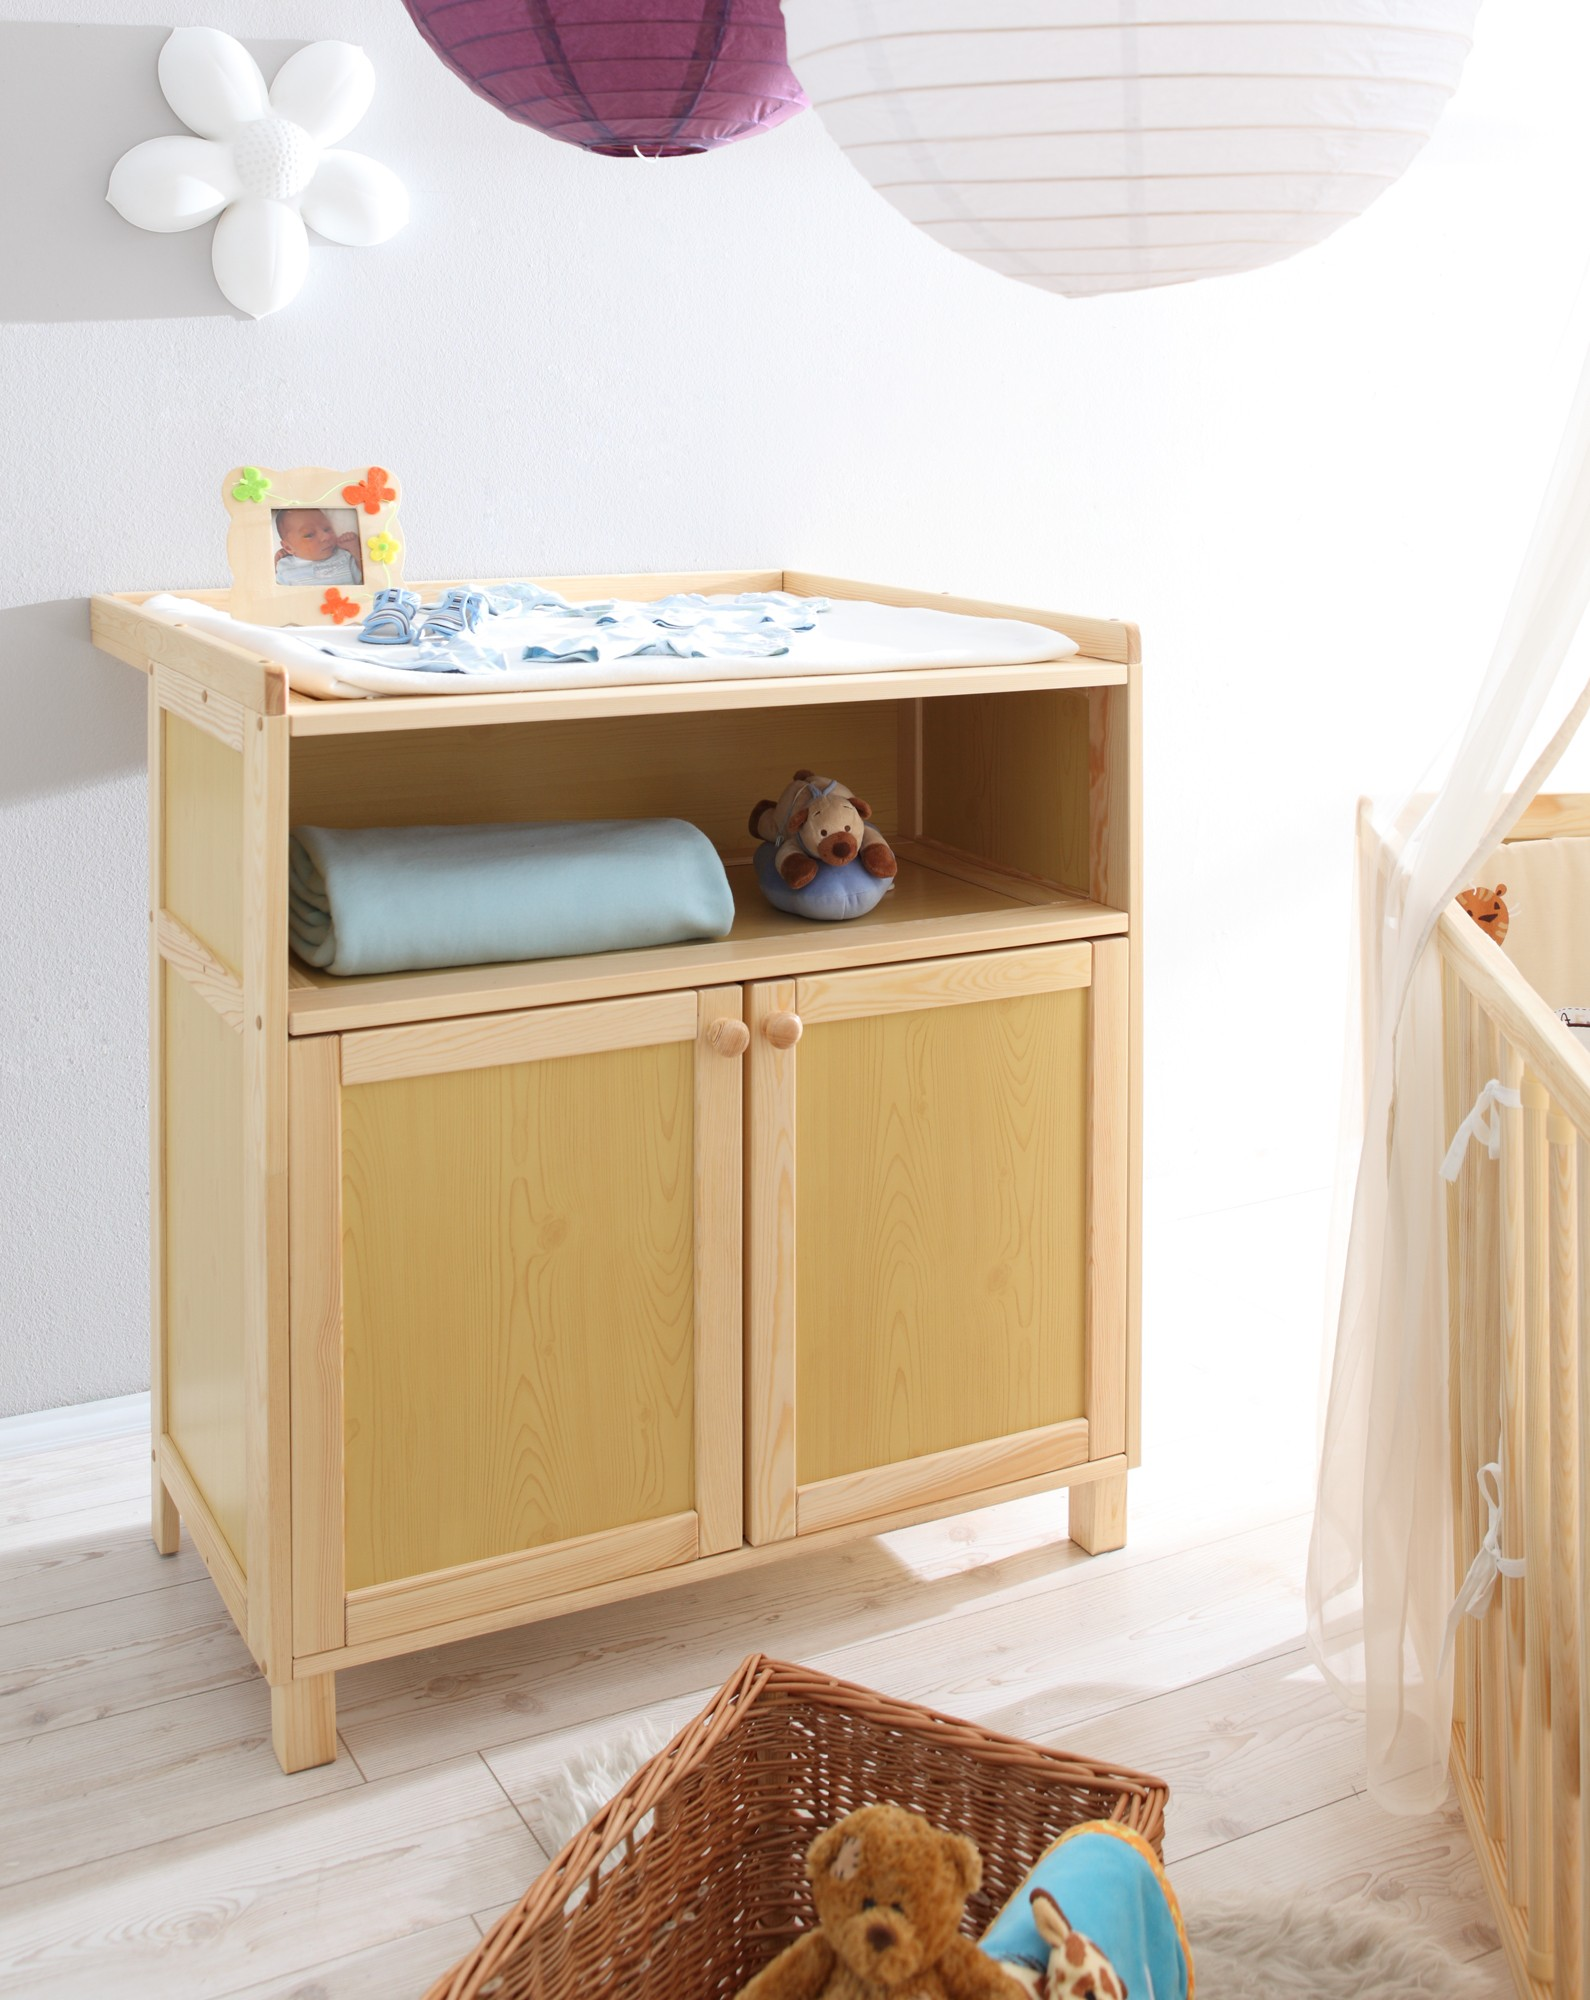 Babyzimmer möbel natur  Babyzimmer 2-teilig Mod.836229 Kiefer Natur - H&C Möbel